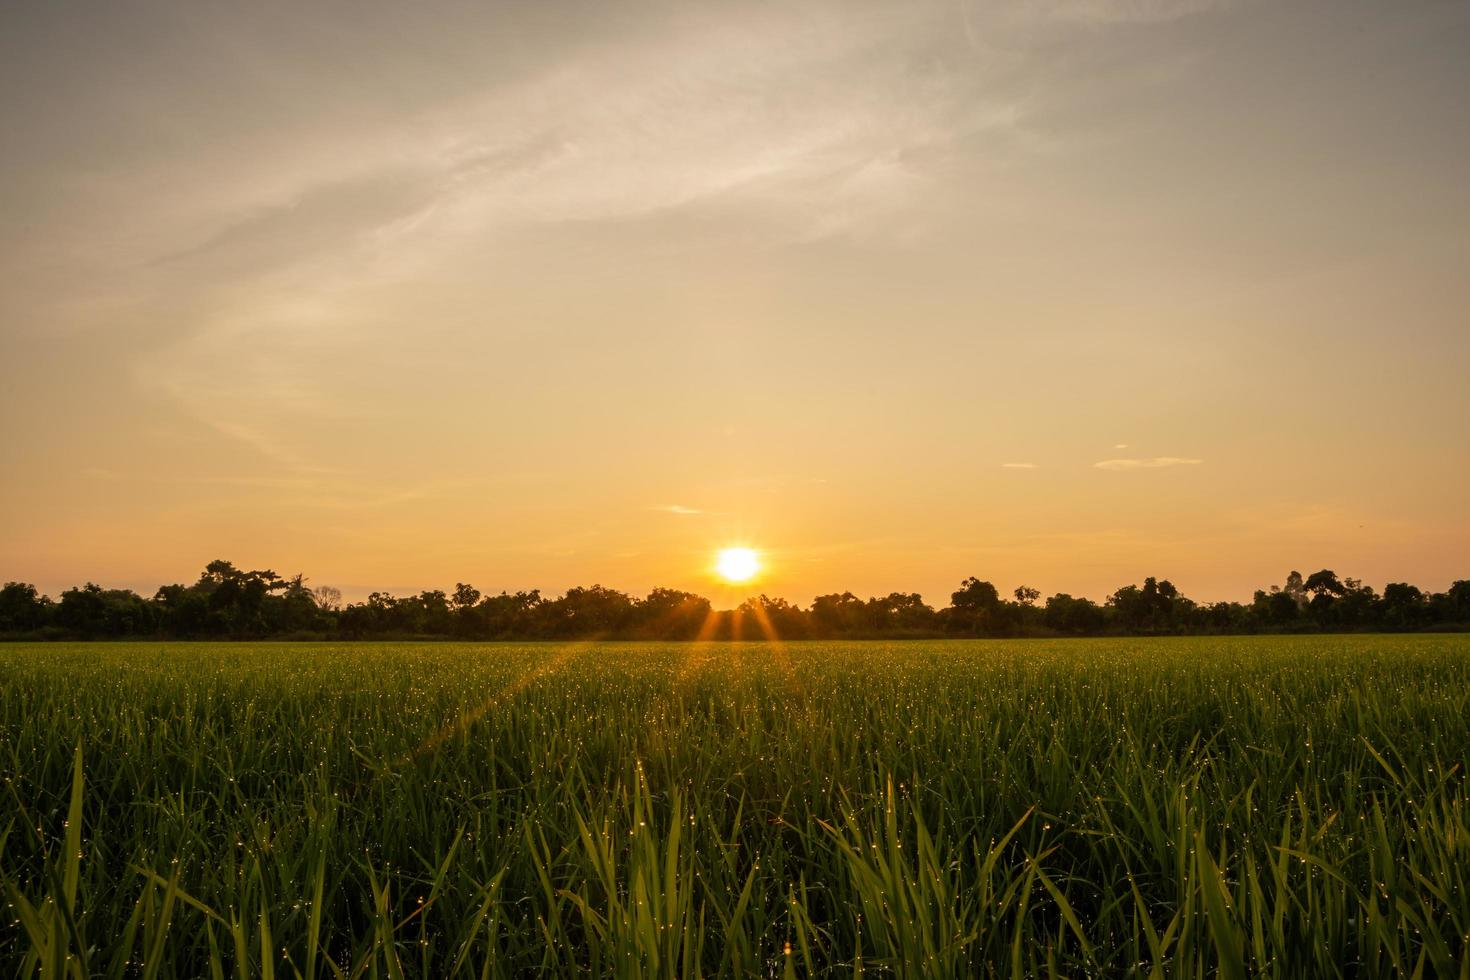 Sonnenaufgang im Reisfeld foto